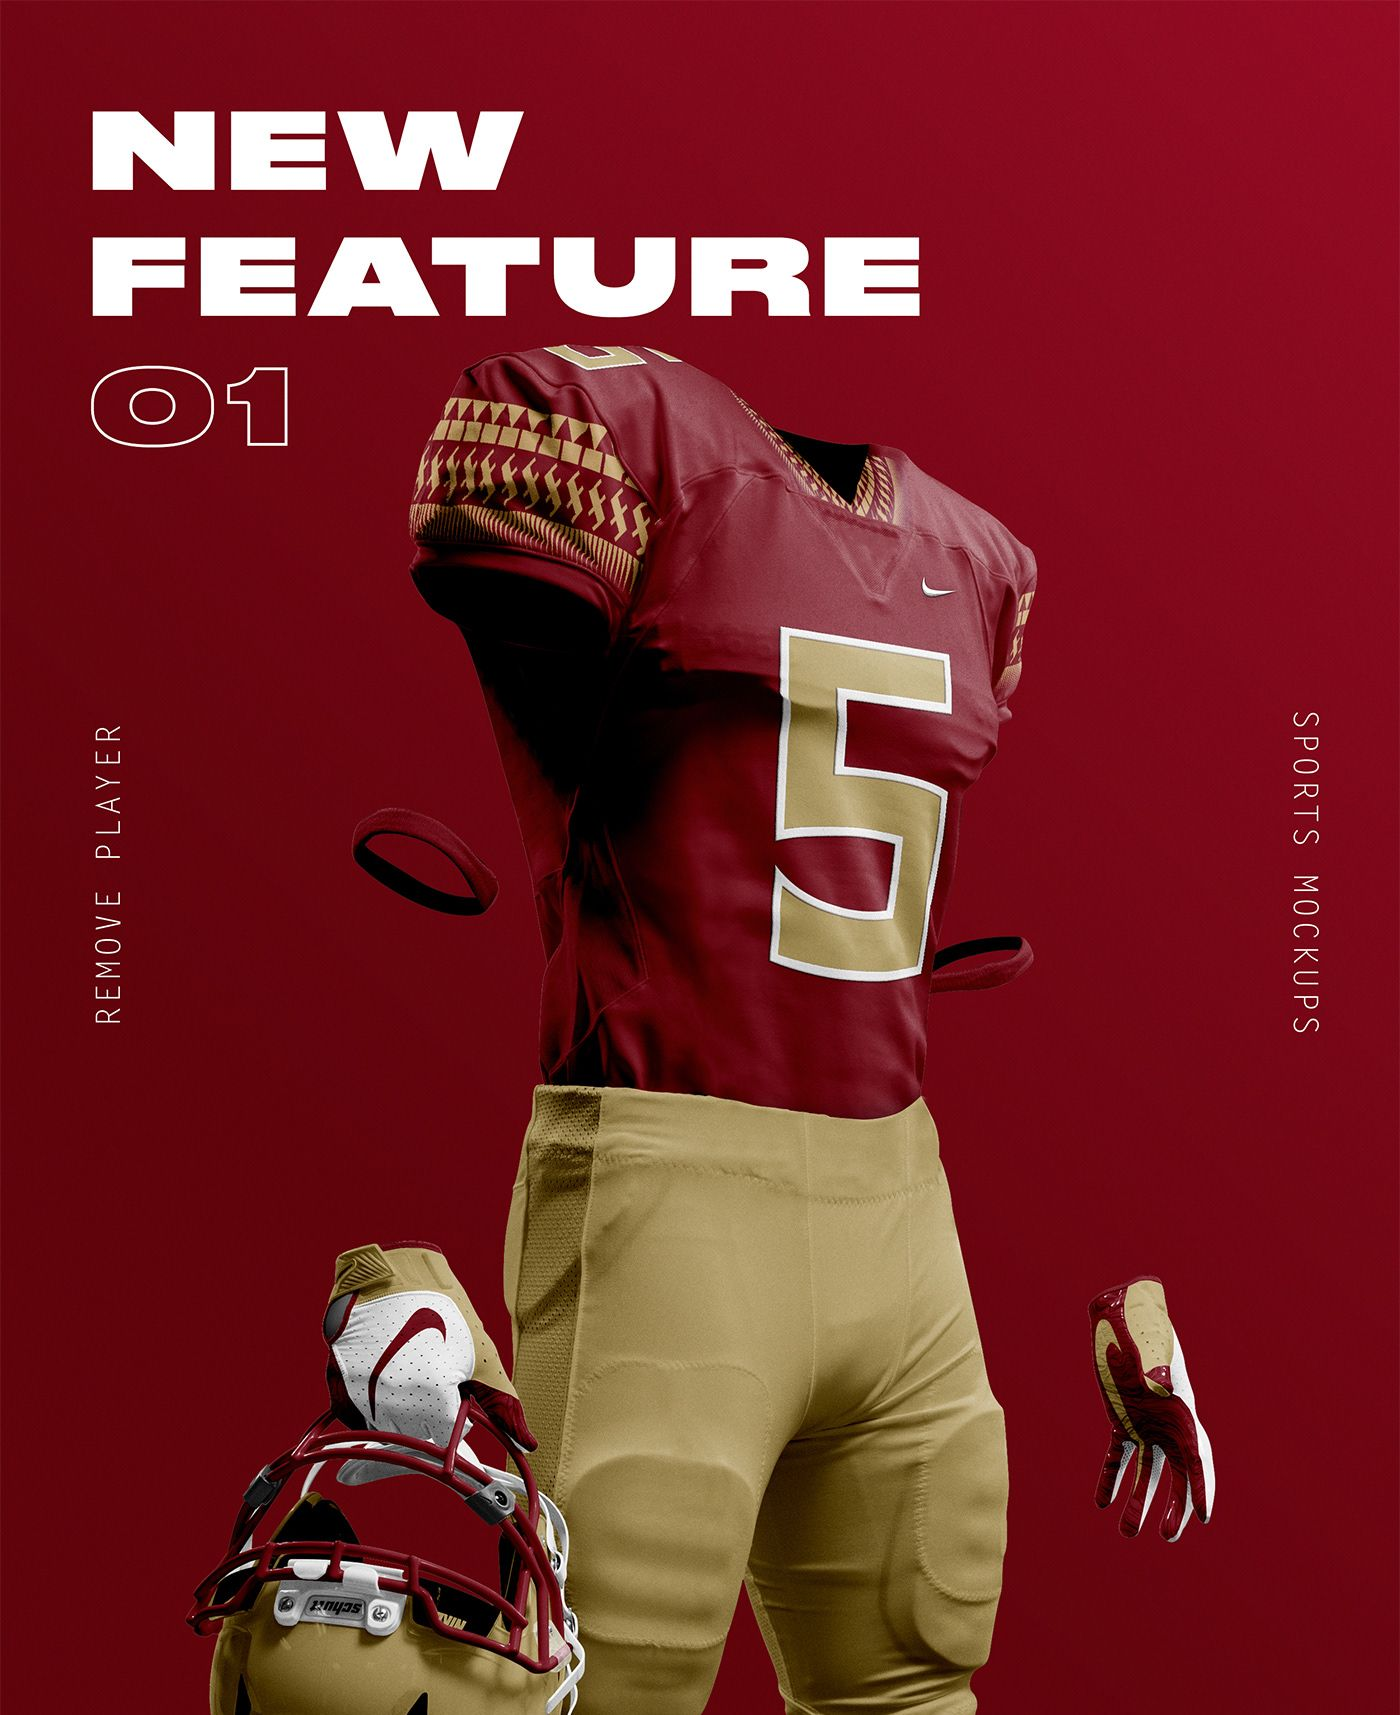 Download 2 0 Nfl Football Mockups Free Psd On Behance Sports Design Sports Graphic Design Nfl Football